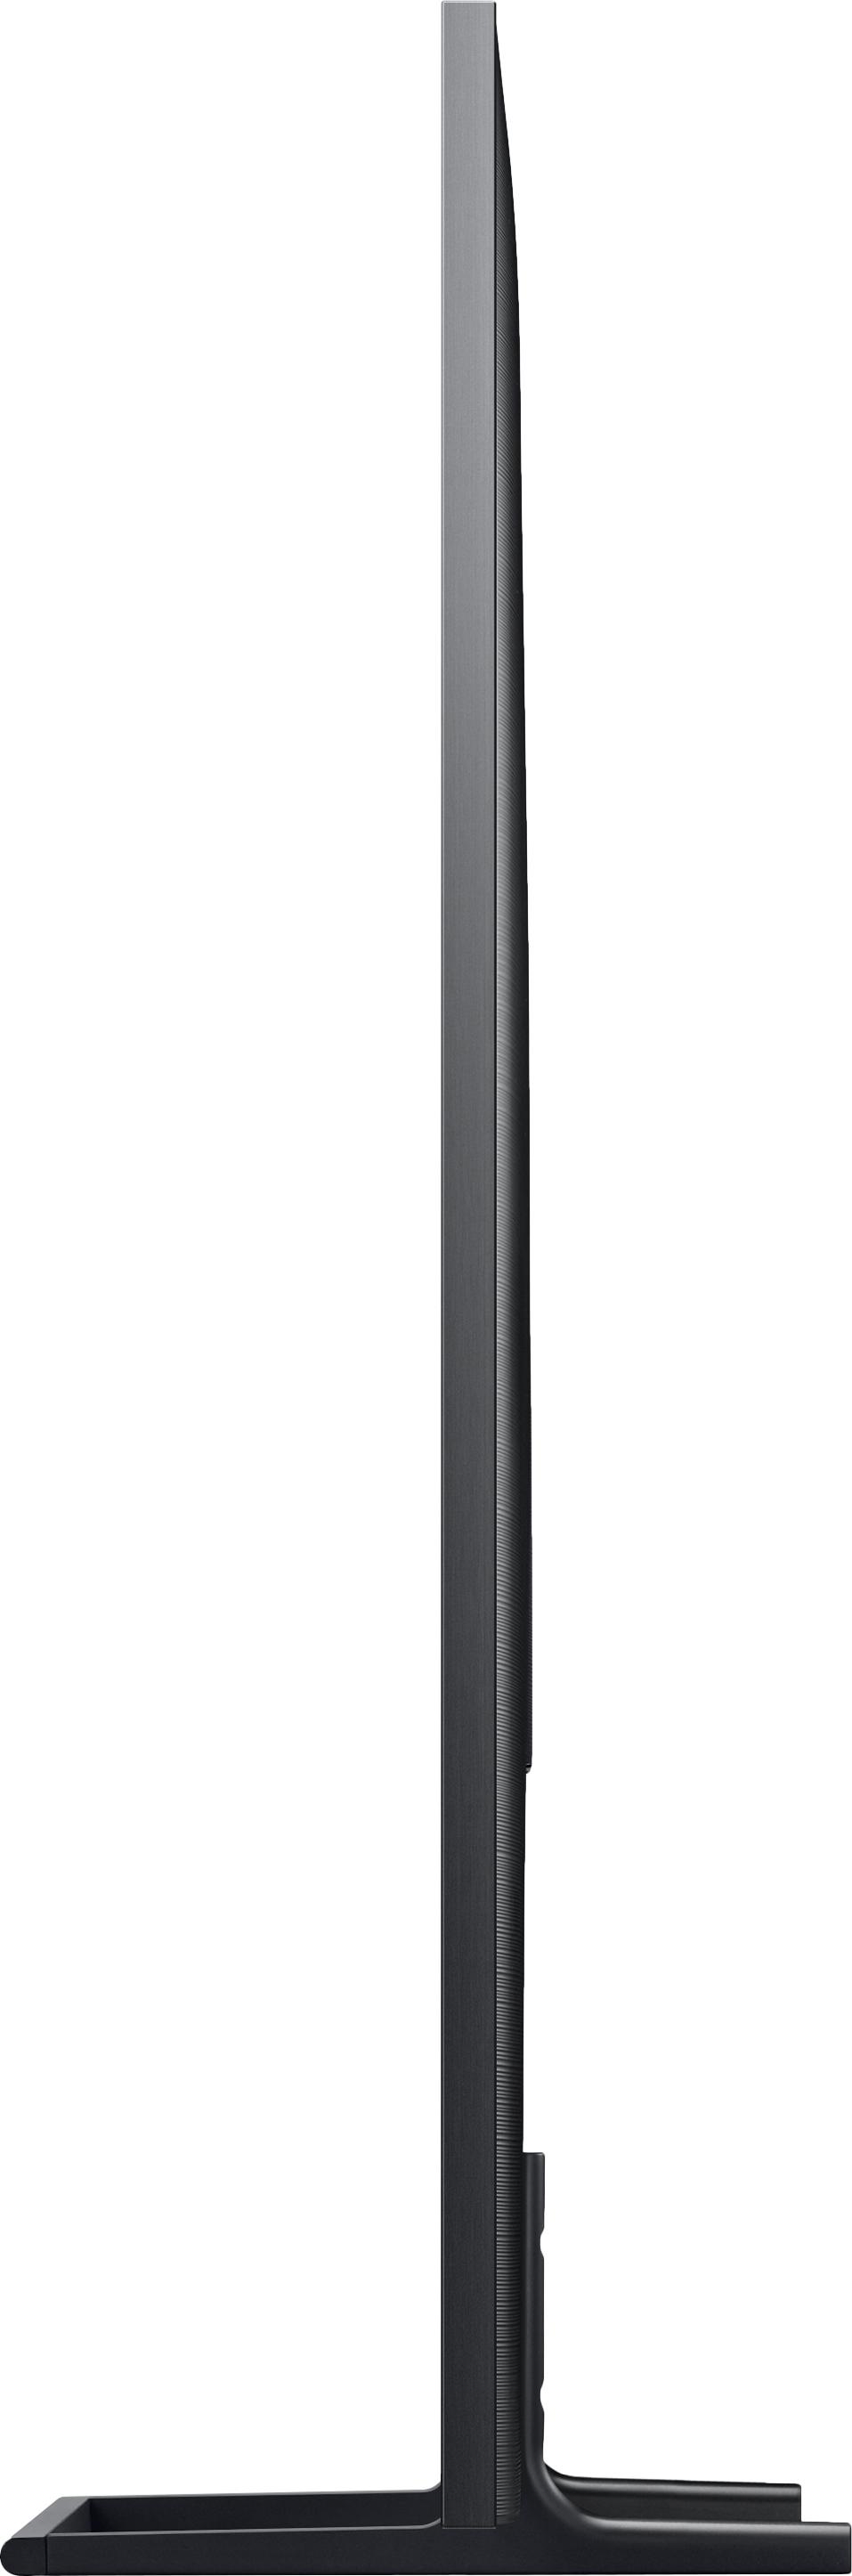 Image 6 for Samsung QN75Q9FNAFXZA